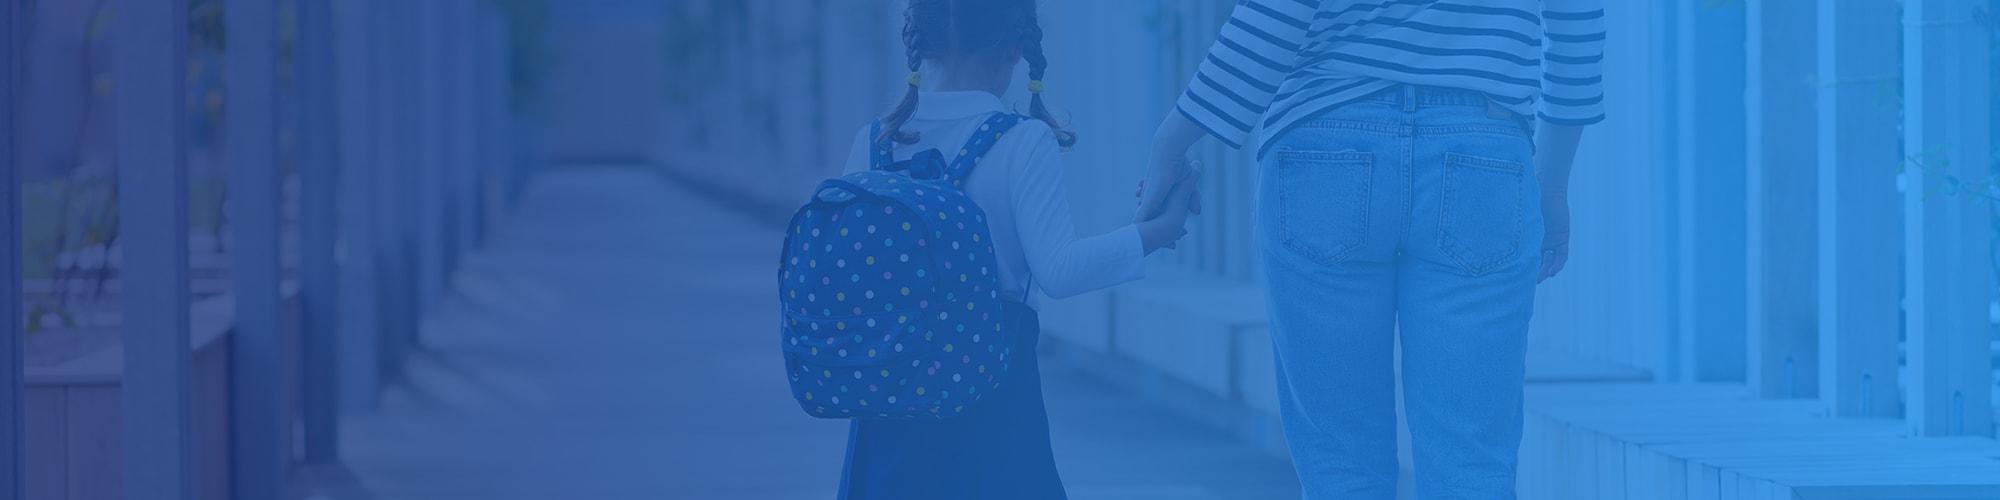 carrier-child-parent-at-school-wide